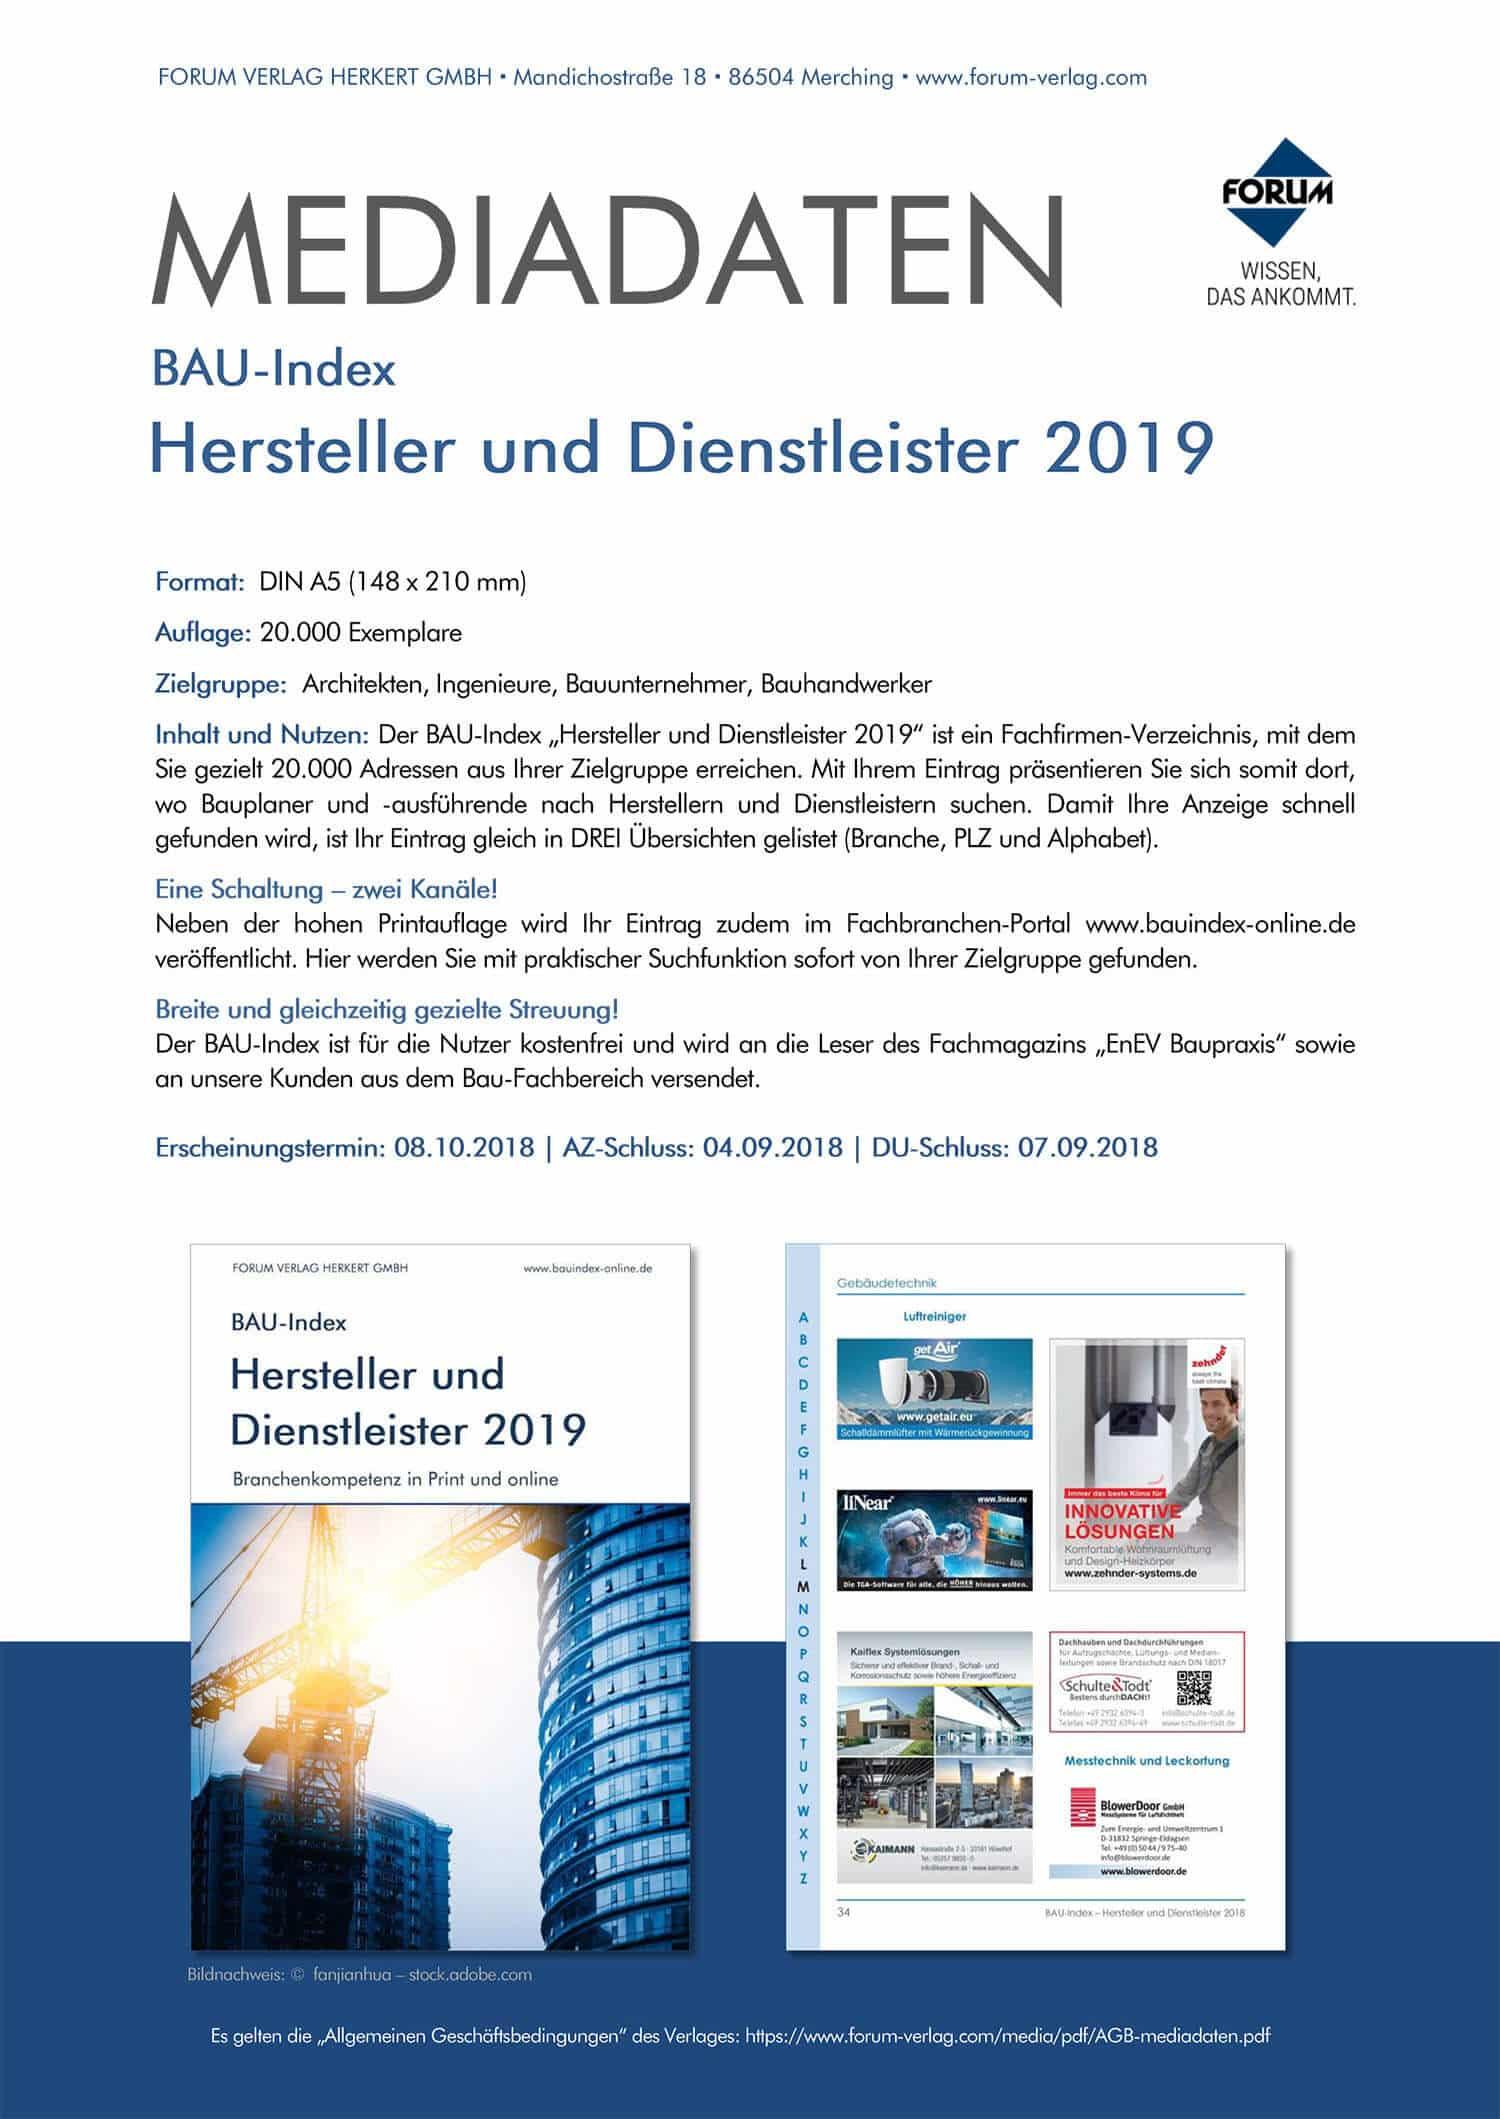 Mediadaten BAU-Index 2019